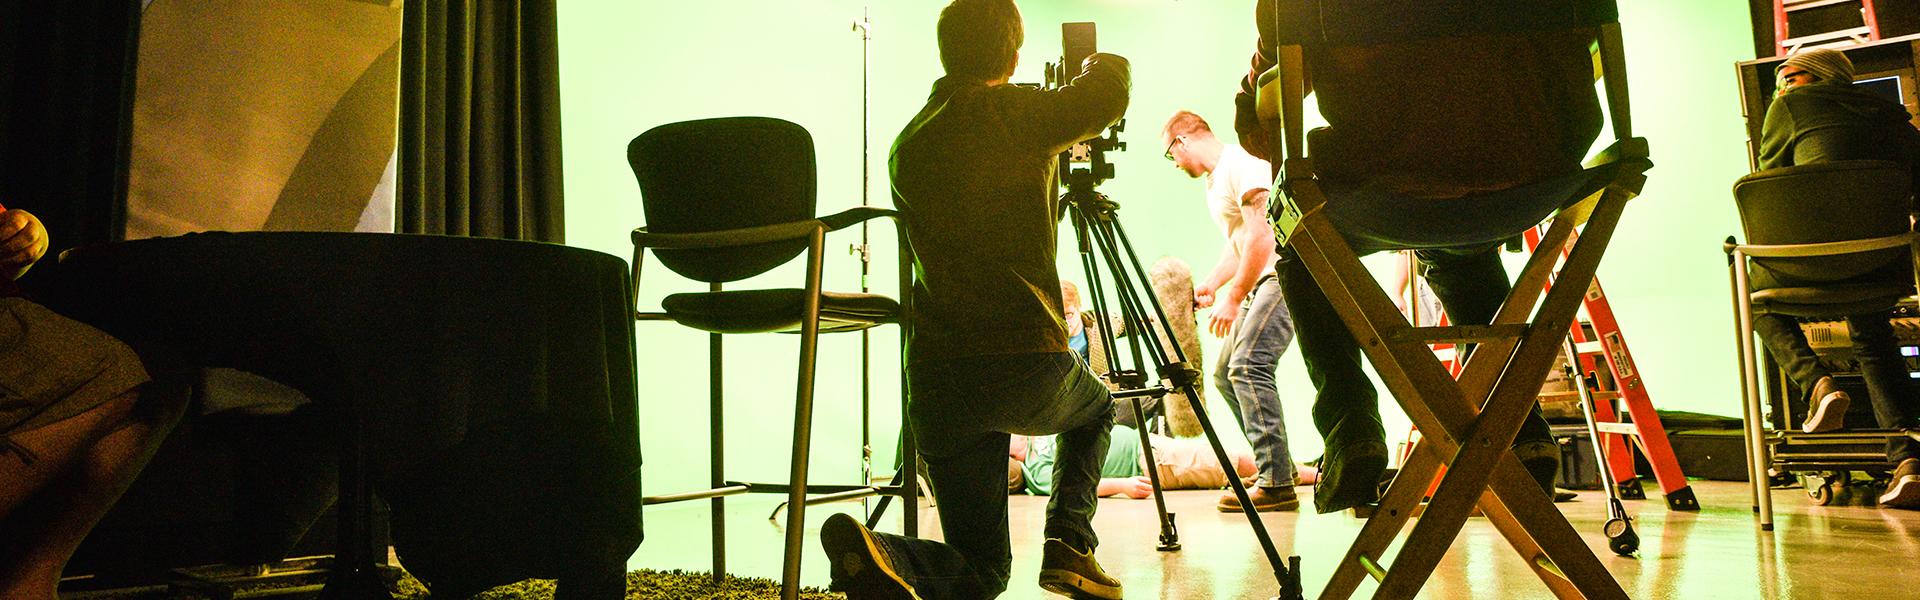 Film students using camera equipment.